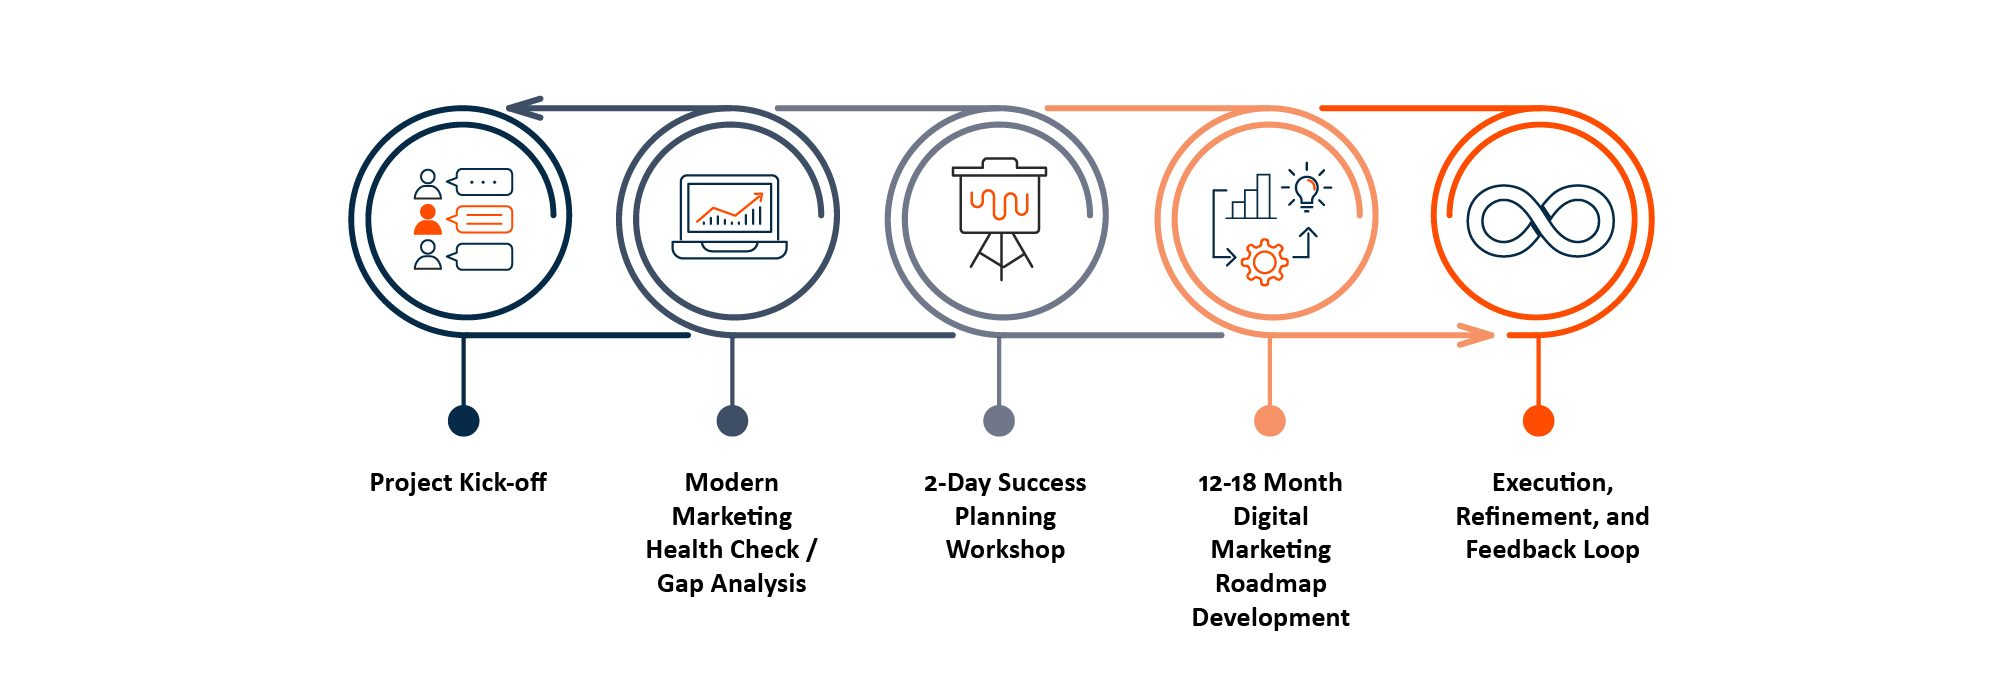 Tegrita Marketing Automation Gap Analysis, Roadmapping and Transformation